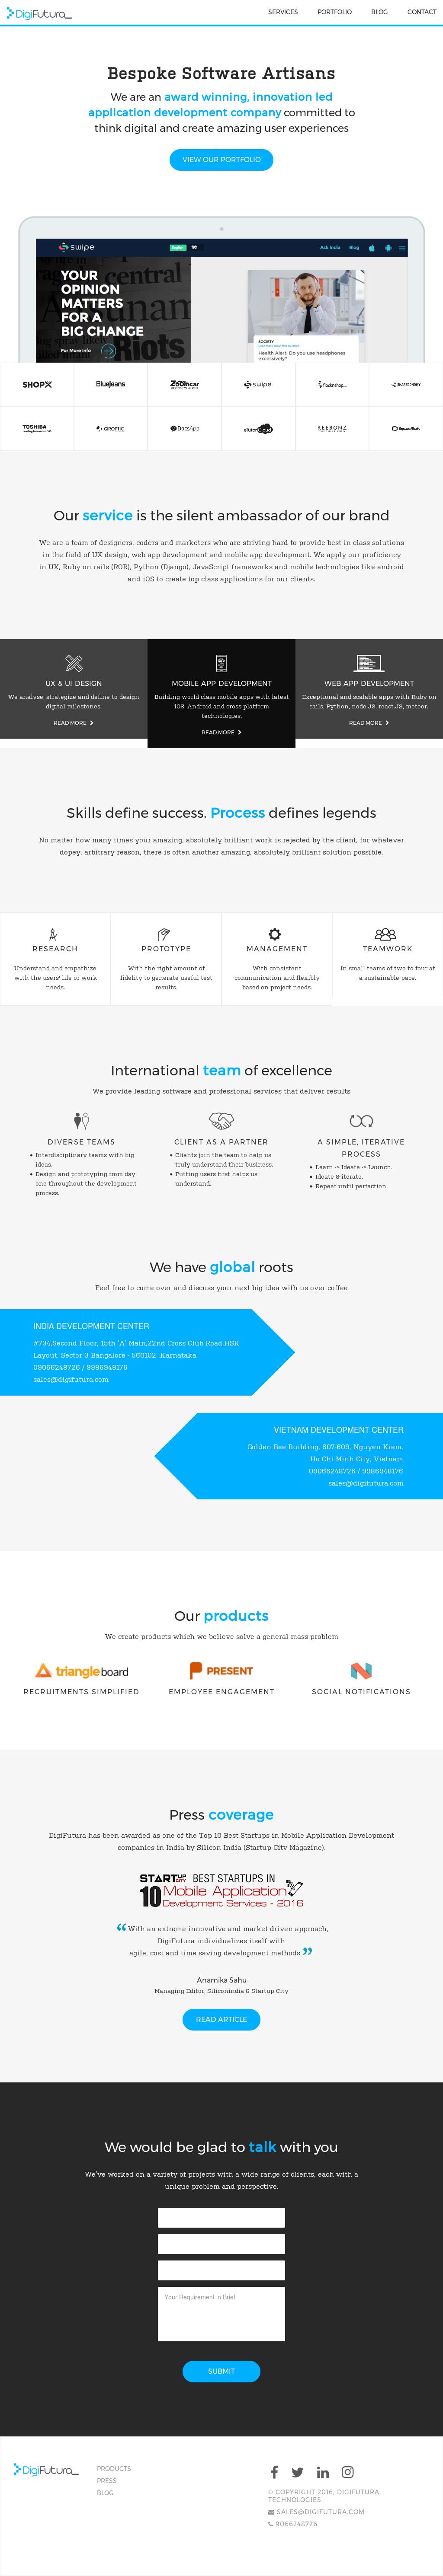 DigiFutura Competitors, Revenue and Employees - Owler Company Profile